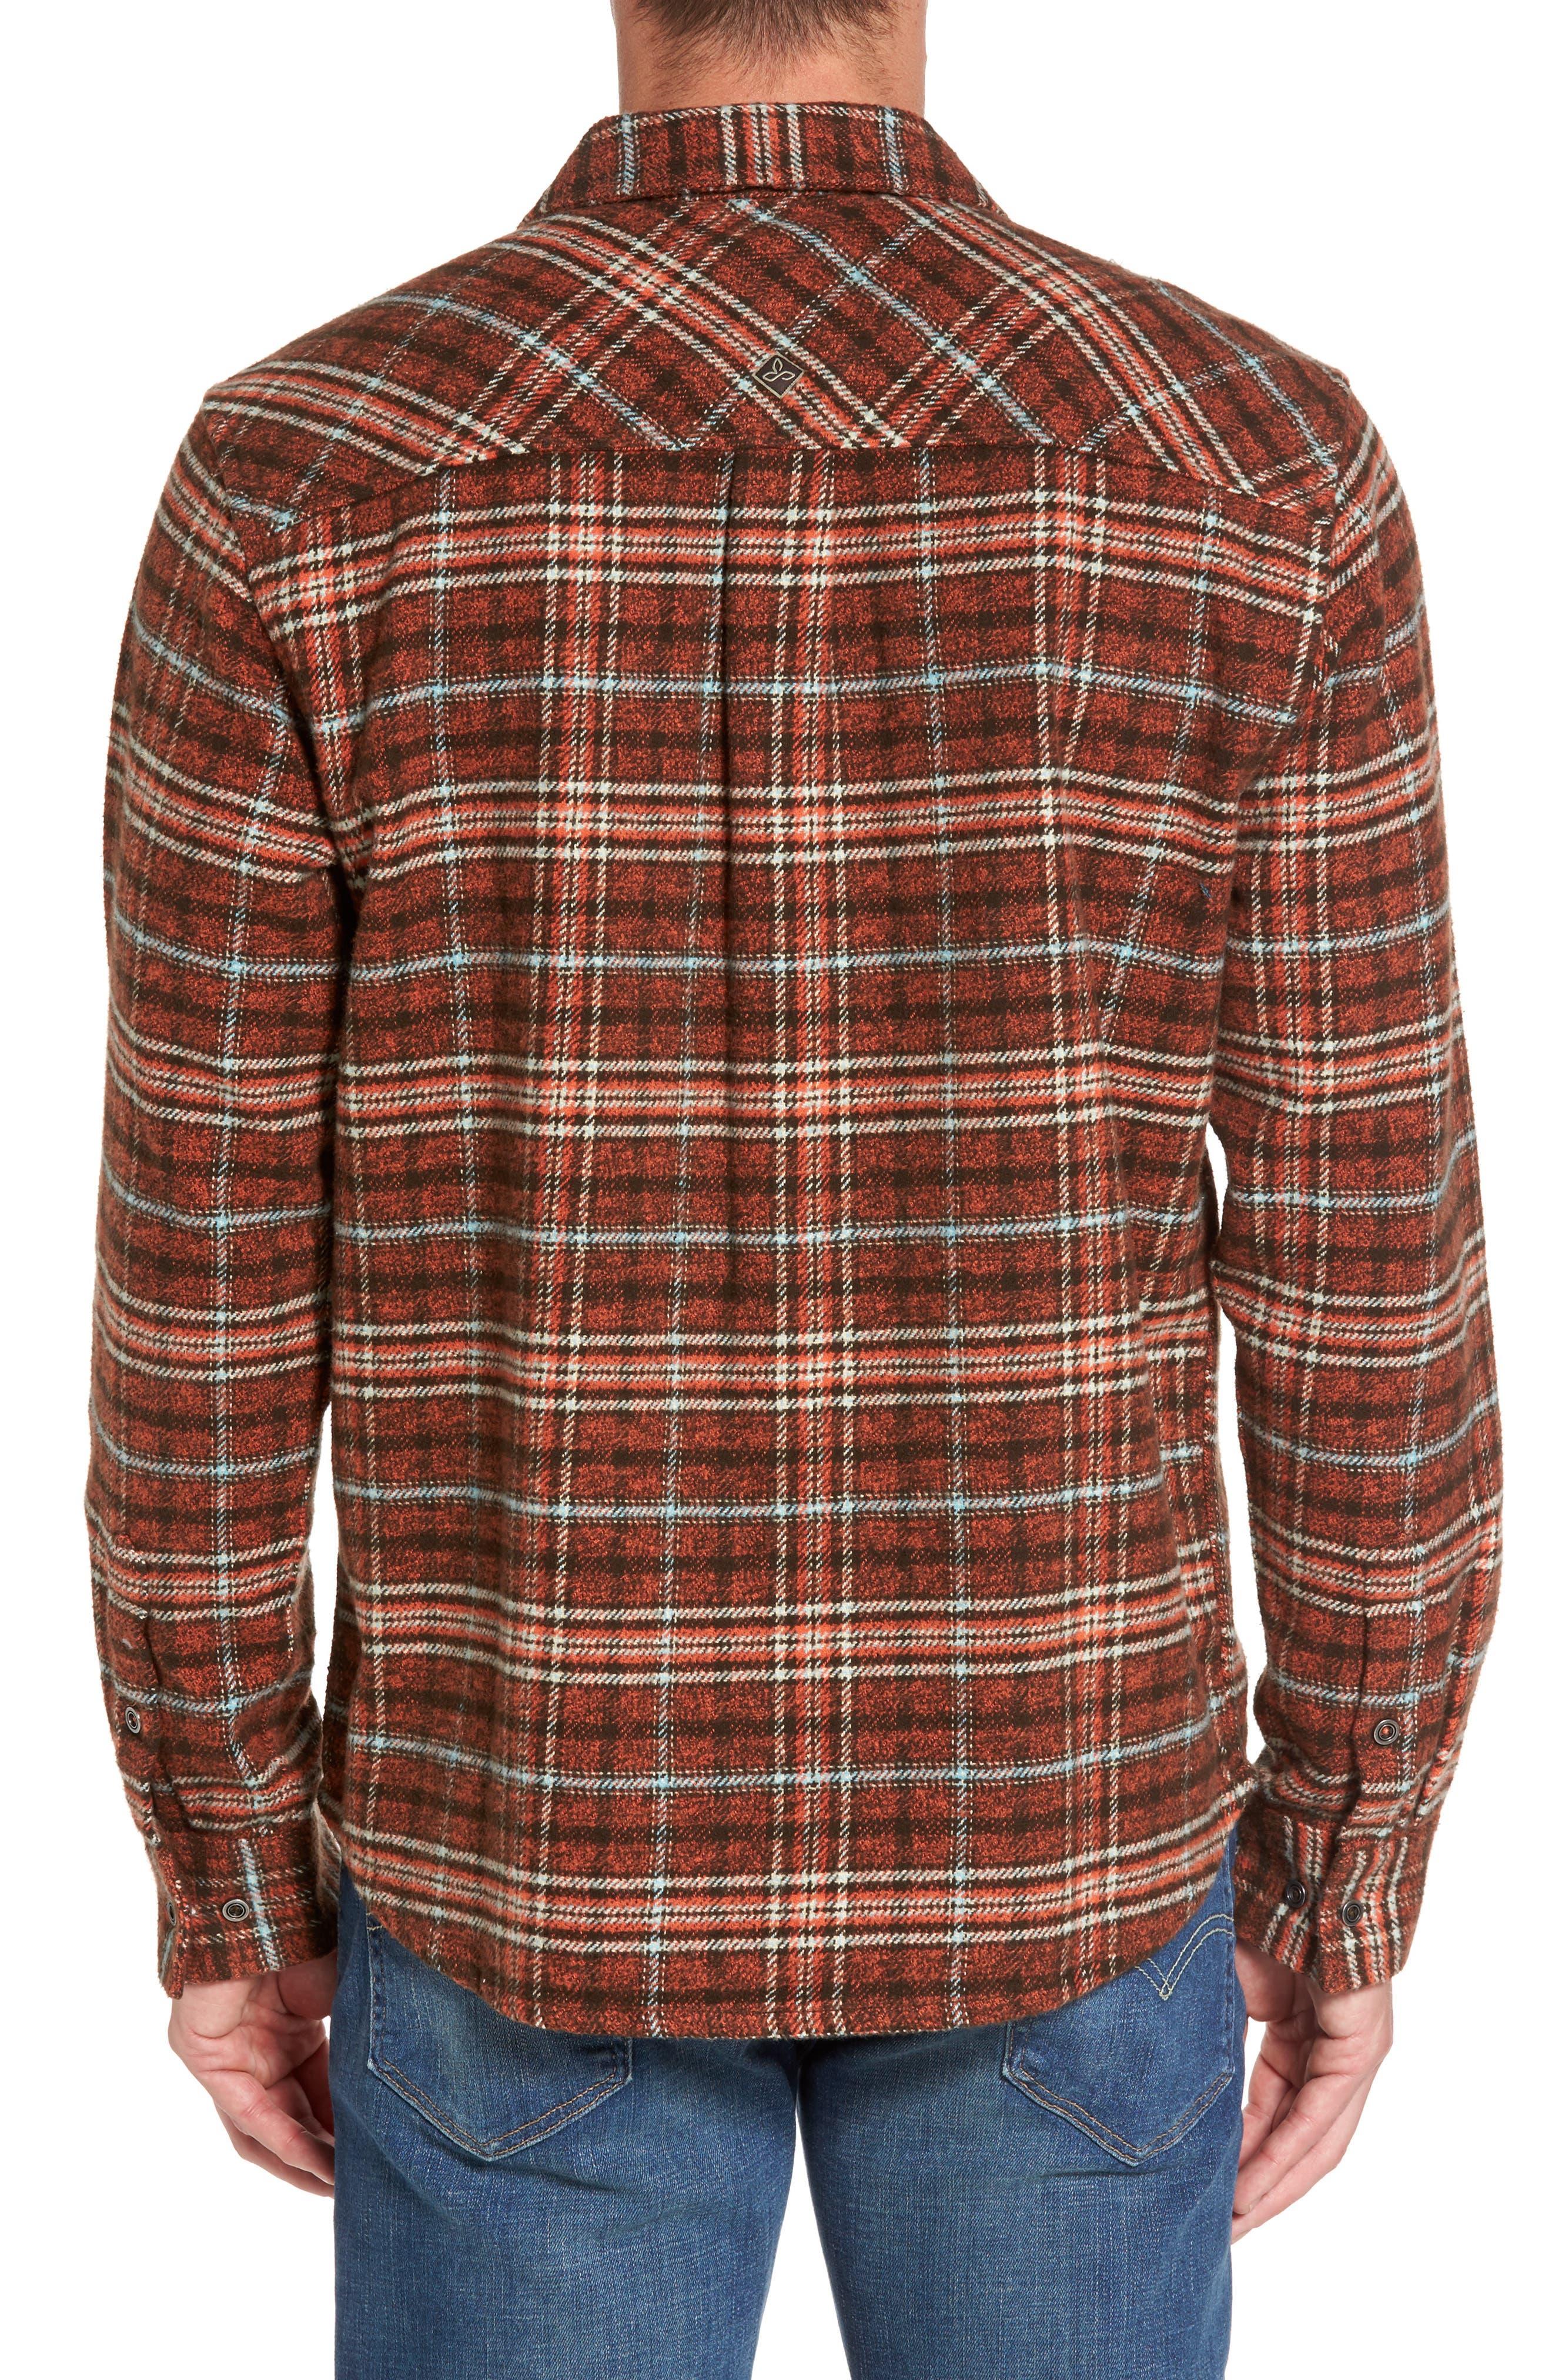 Brayden Regular Fit Plaid Flannel Shirt,                             Alternate thumbnail 4, color,